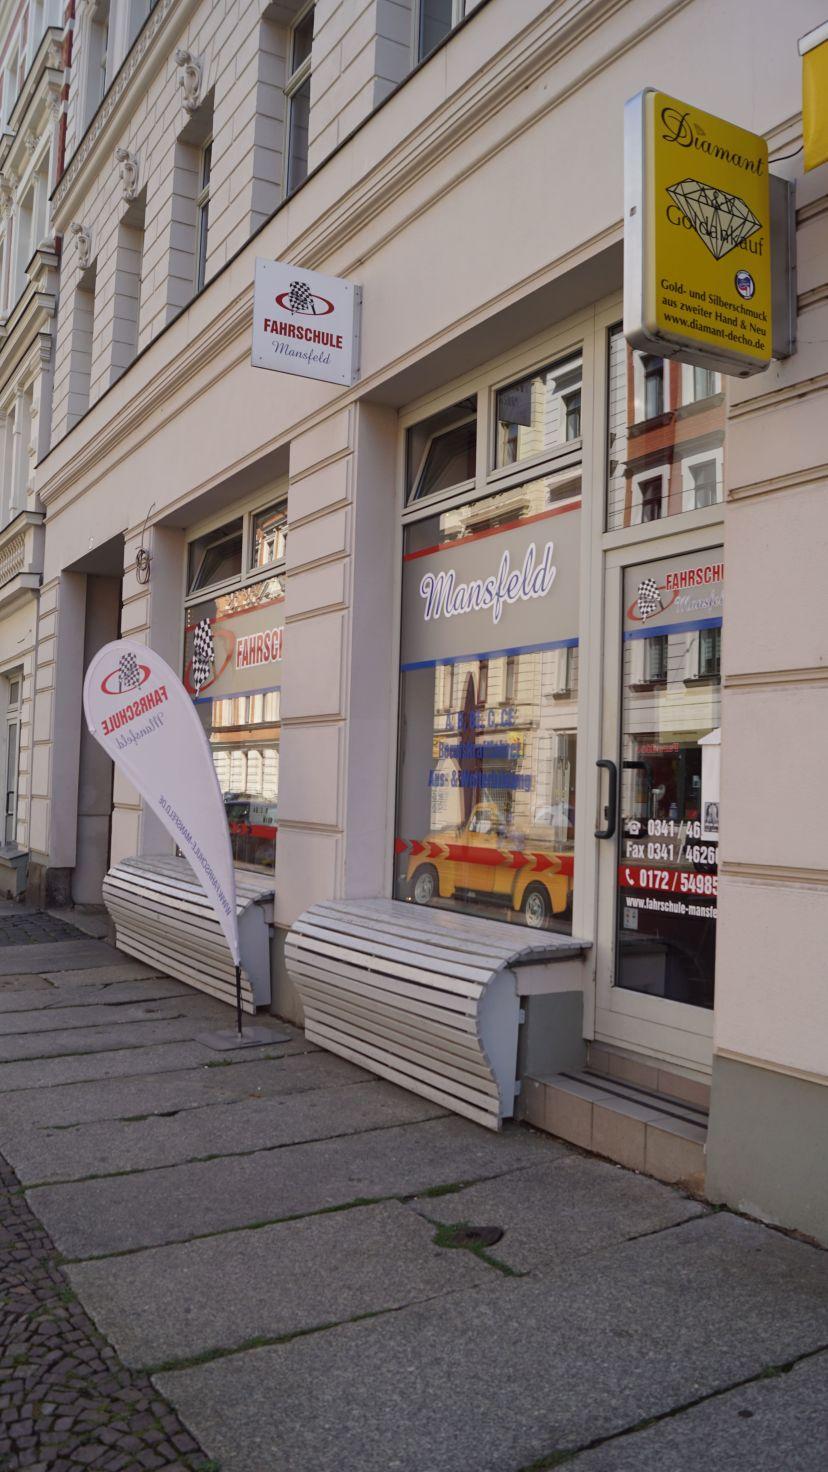 Fahrschule Mansfeld - Arthur-Hoffmann-Str.89 Südvorstadt 3